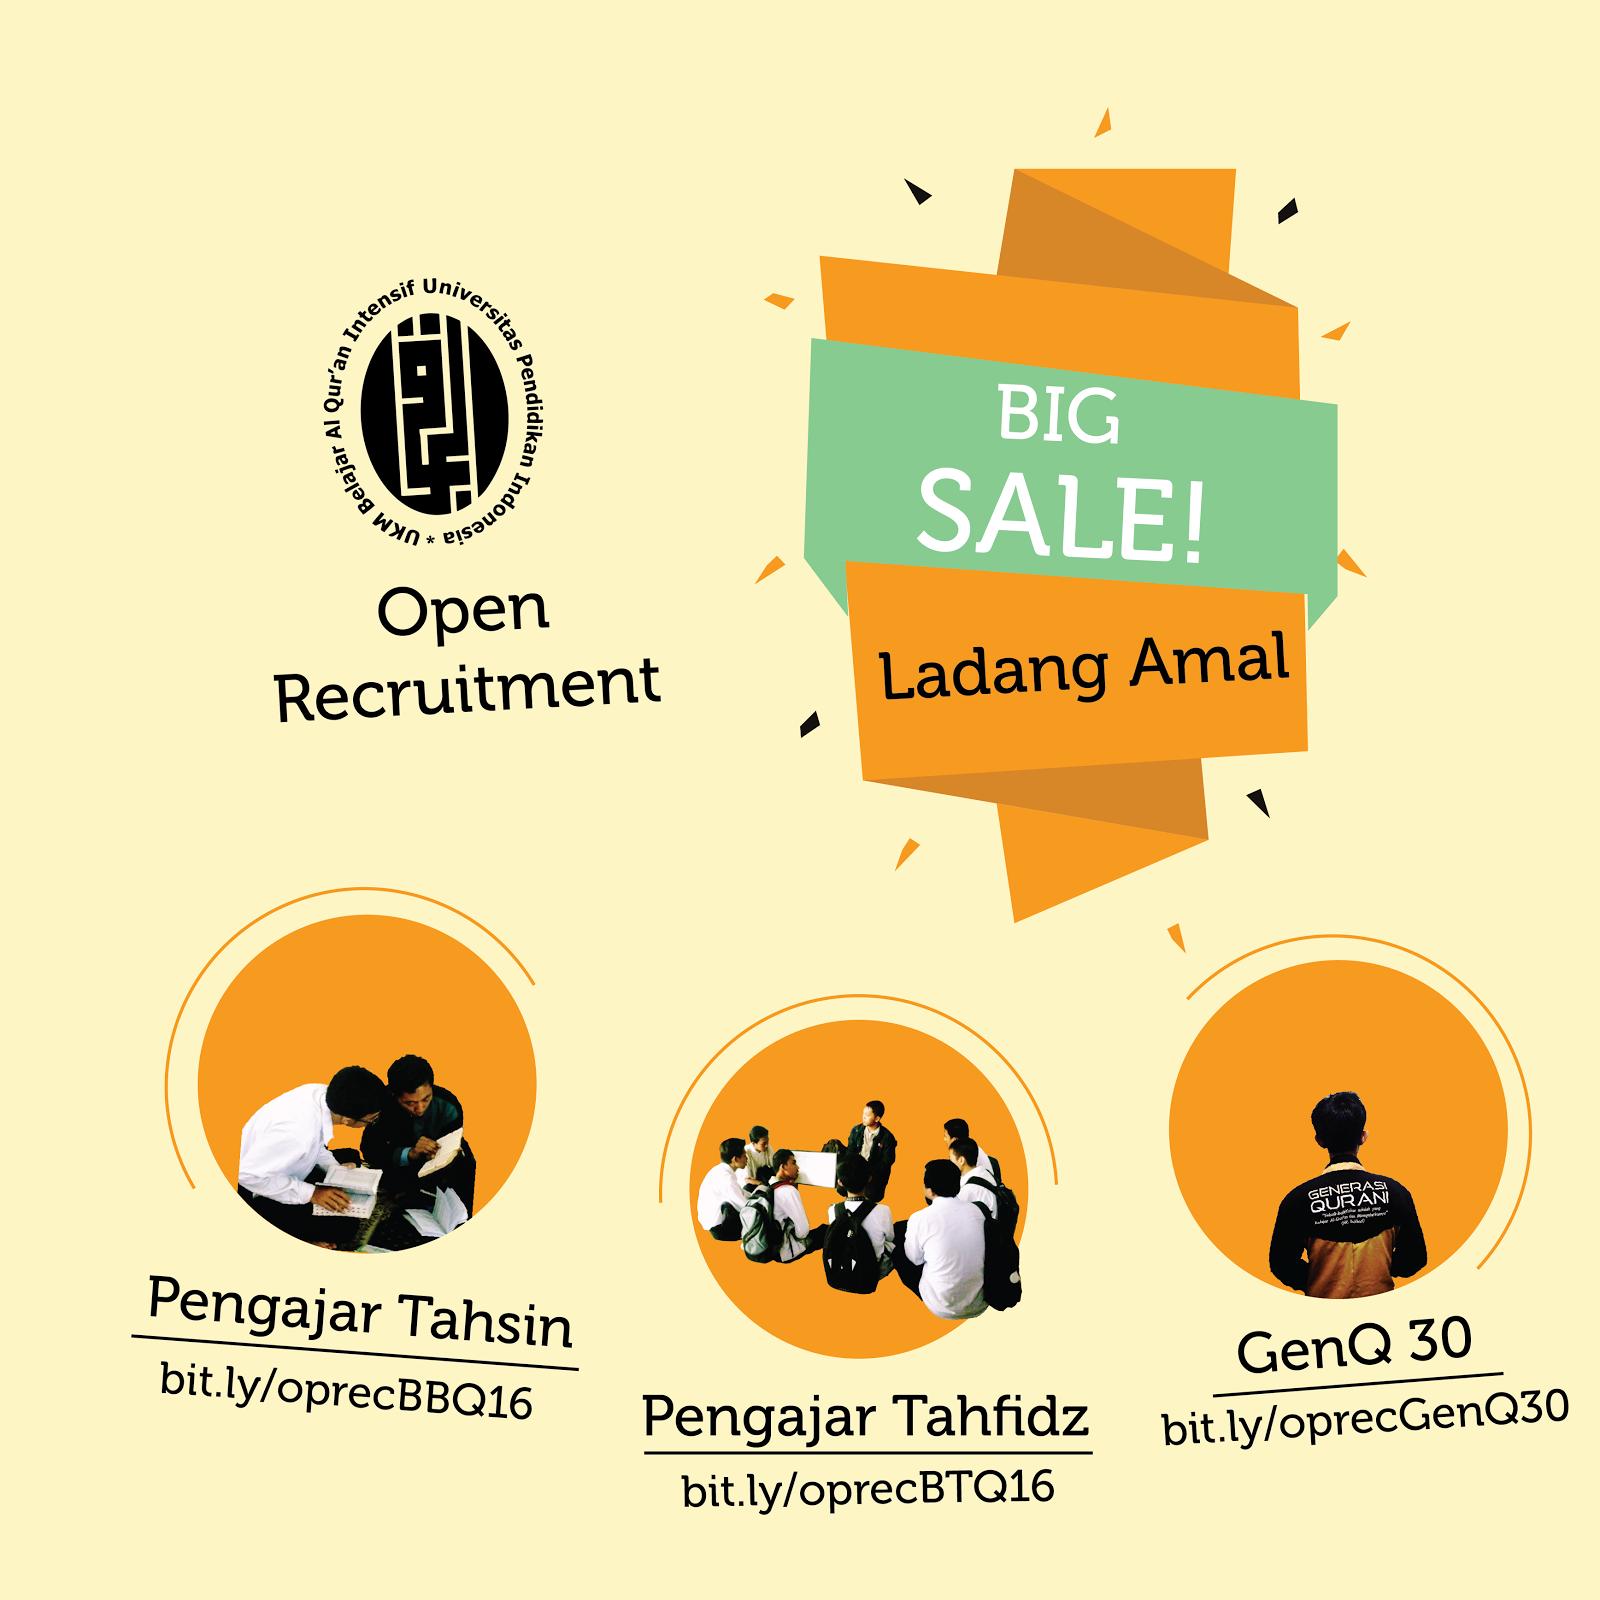 Big Sale! Ladang Amal di UPI